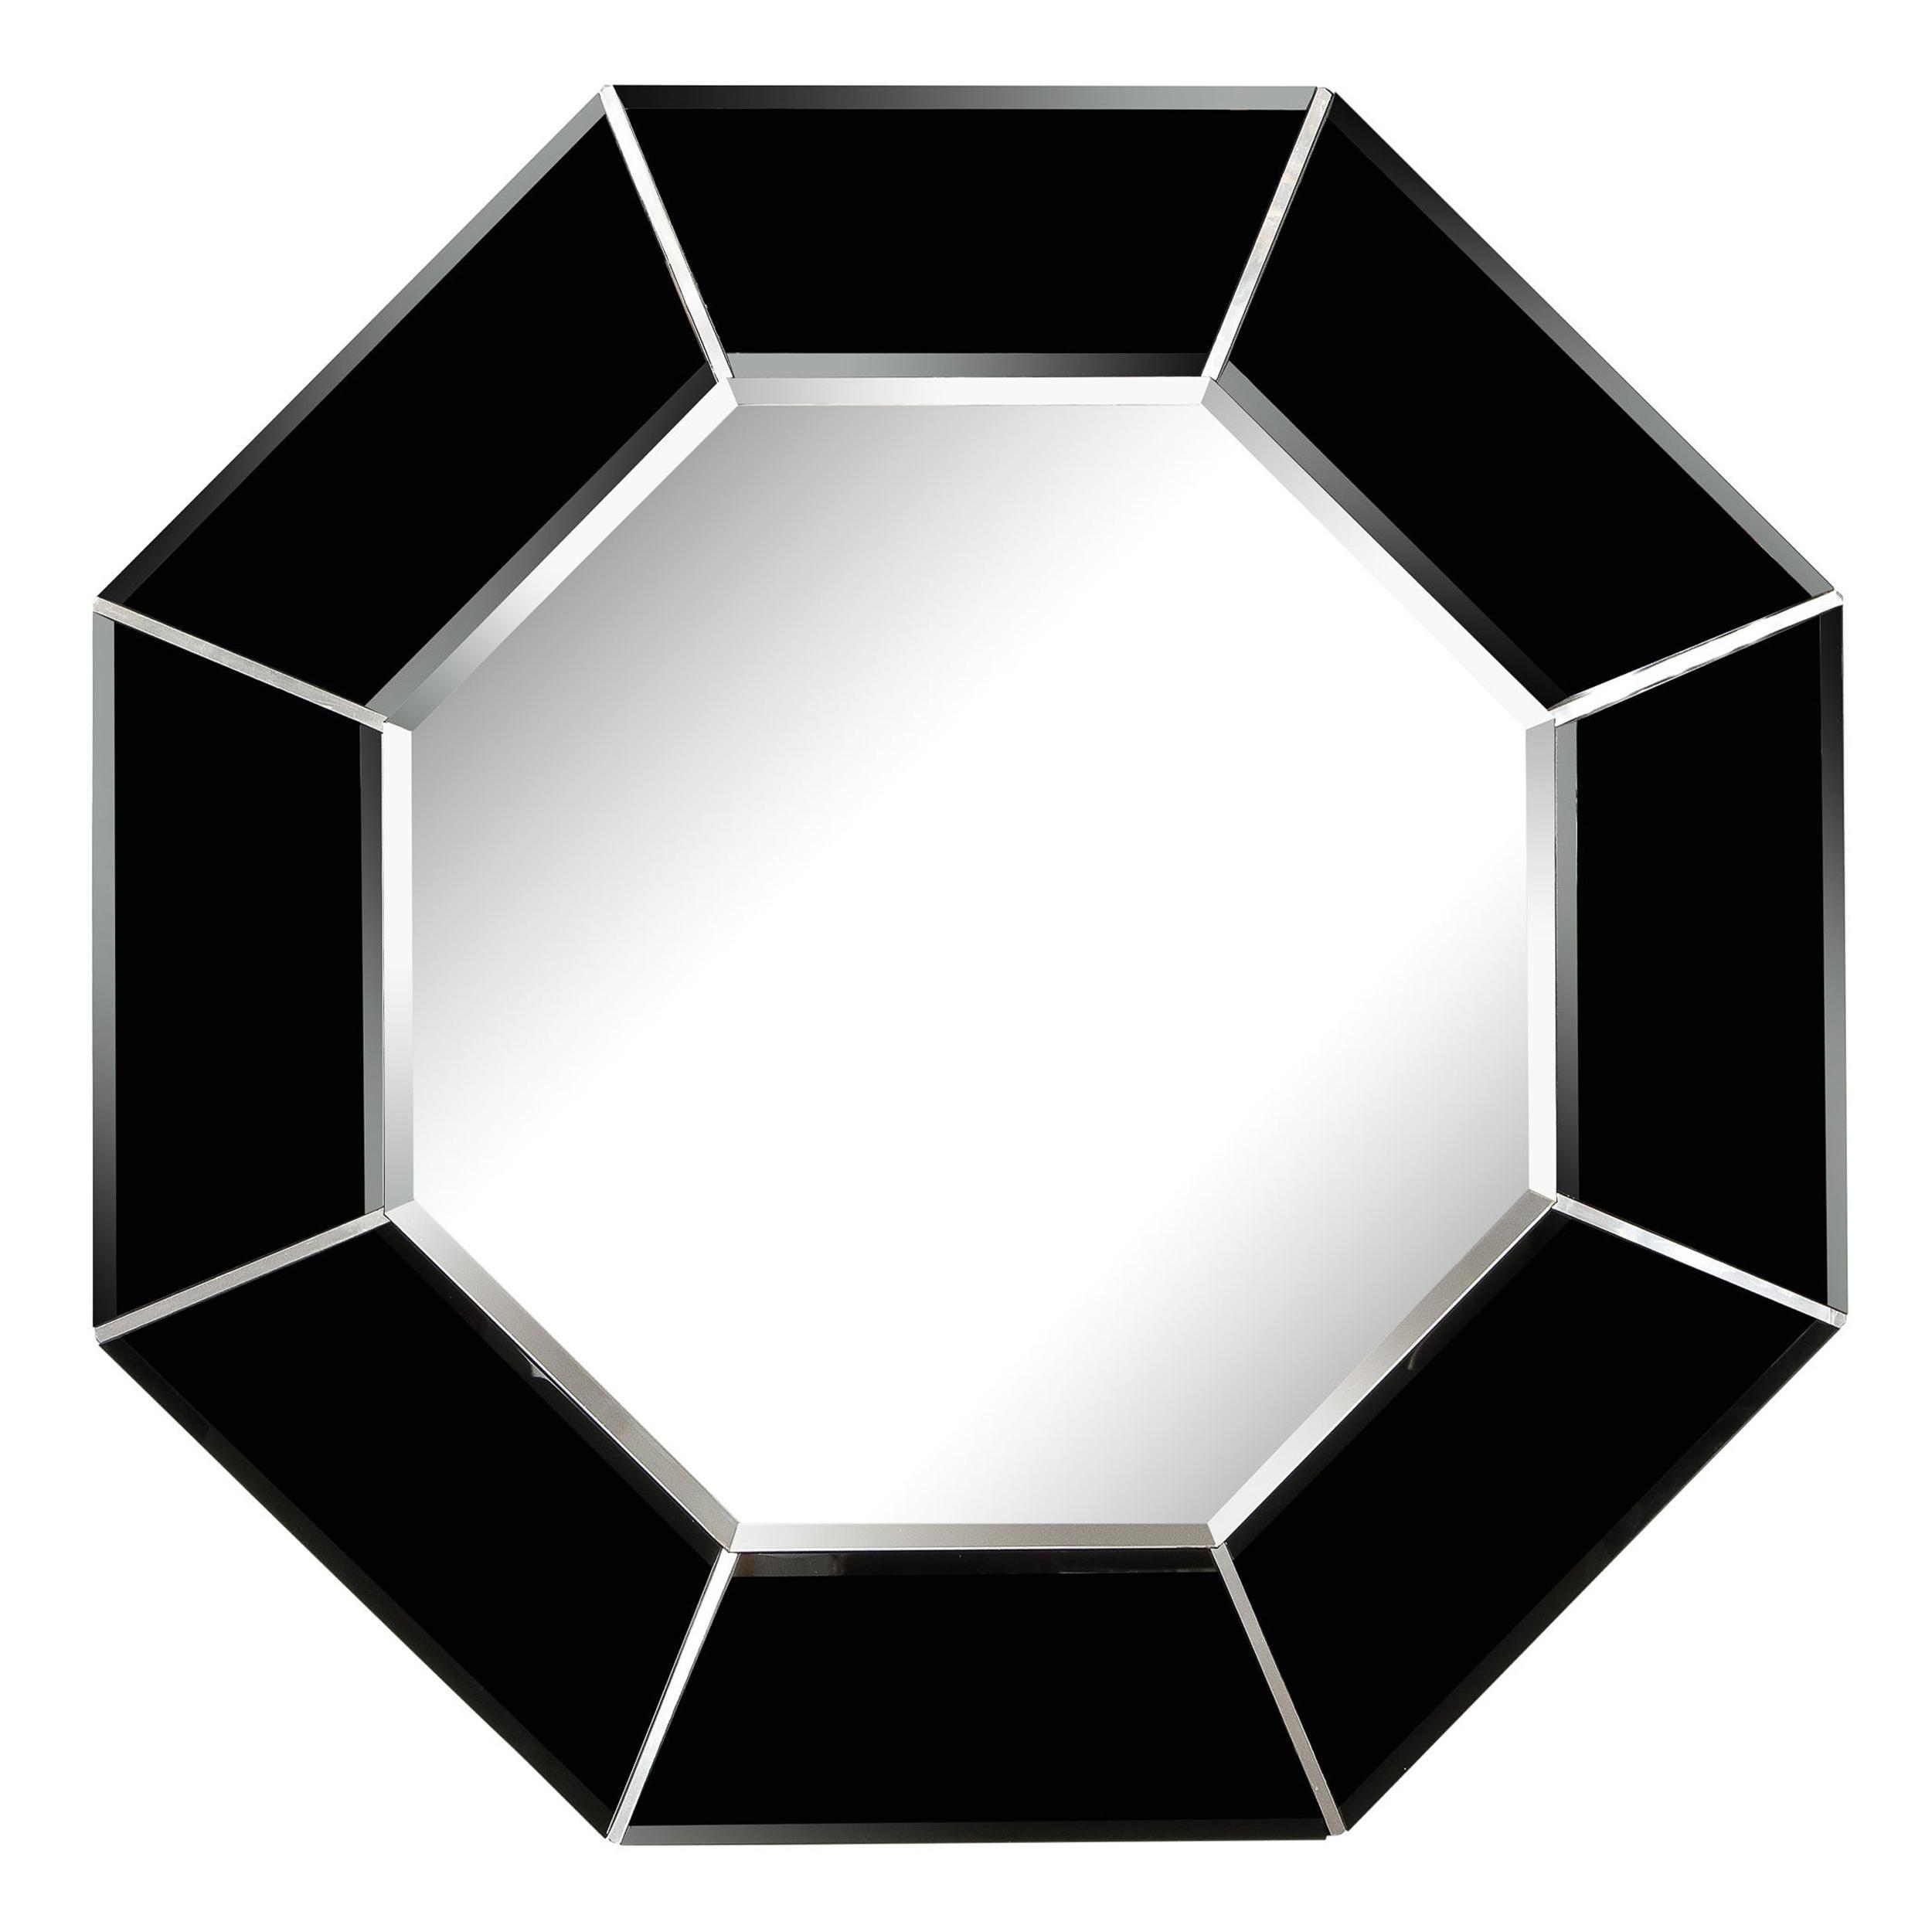 Mid-Century Modern Octagonal Beveled Smoked Mirror with Brushed Aluminum Inserts